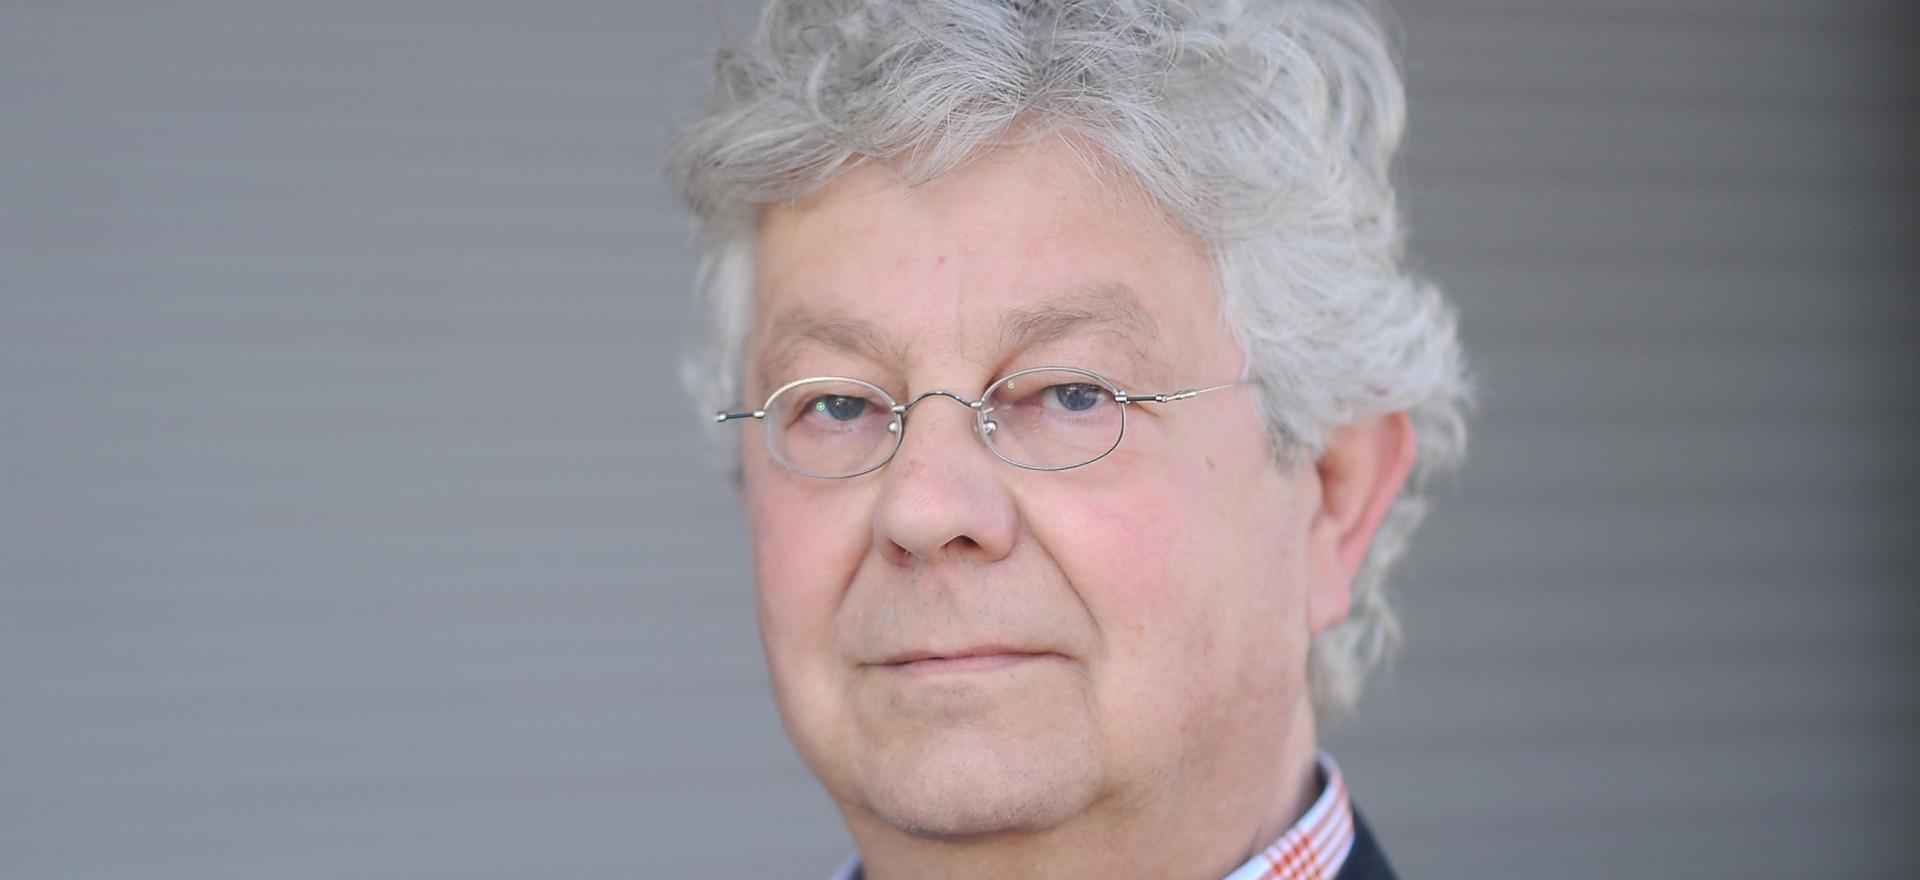 Manfred Spaltenberger, Winzerhausen Geschäftsleitung der Firma TT-SIUS (Technologie Transfer Systemintegrierter Umweltschutz))